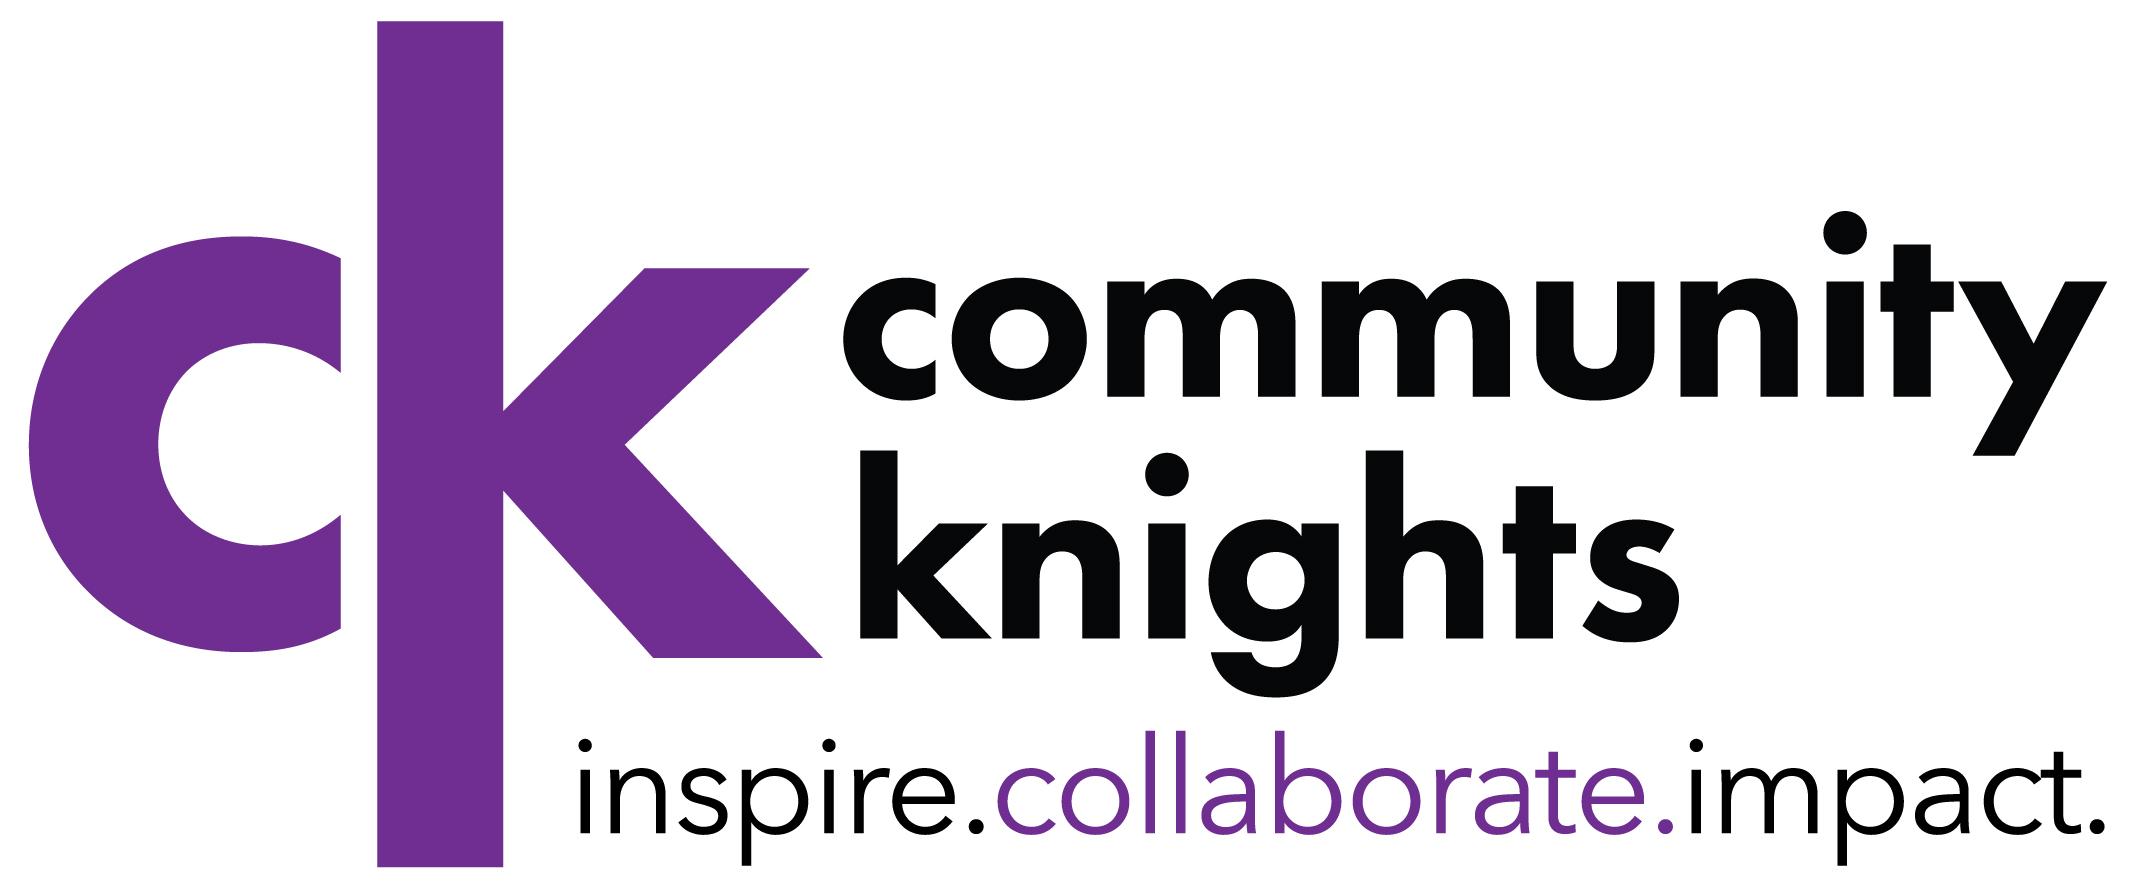 CommunityKnights_LOGO2